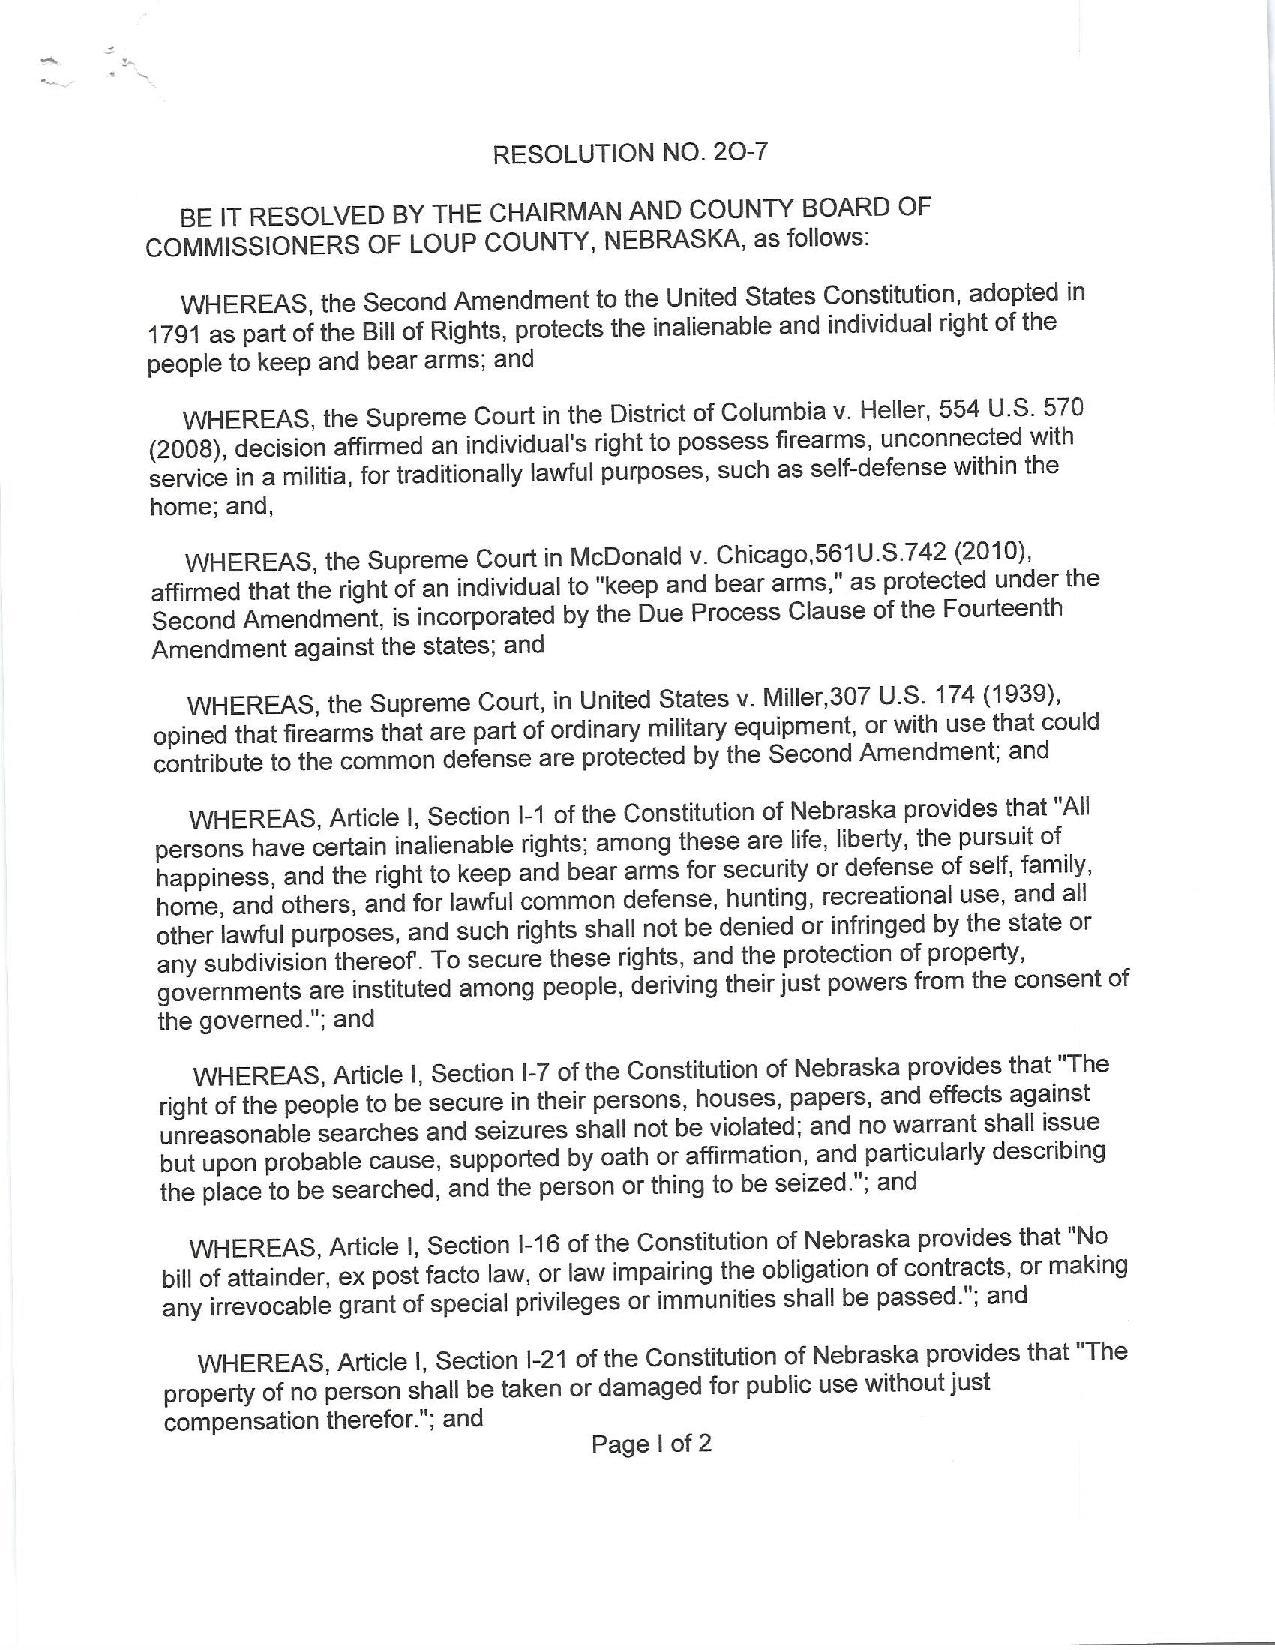 Loup County Nebraska Second Amendment Support Resolution Page 1